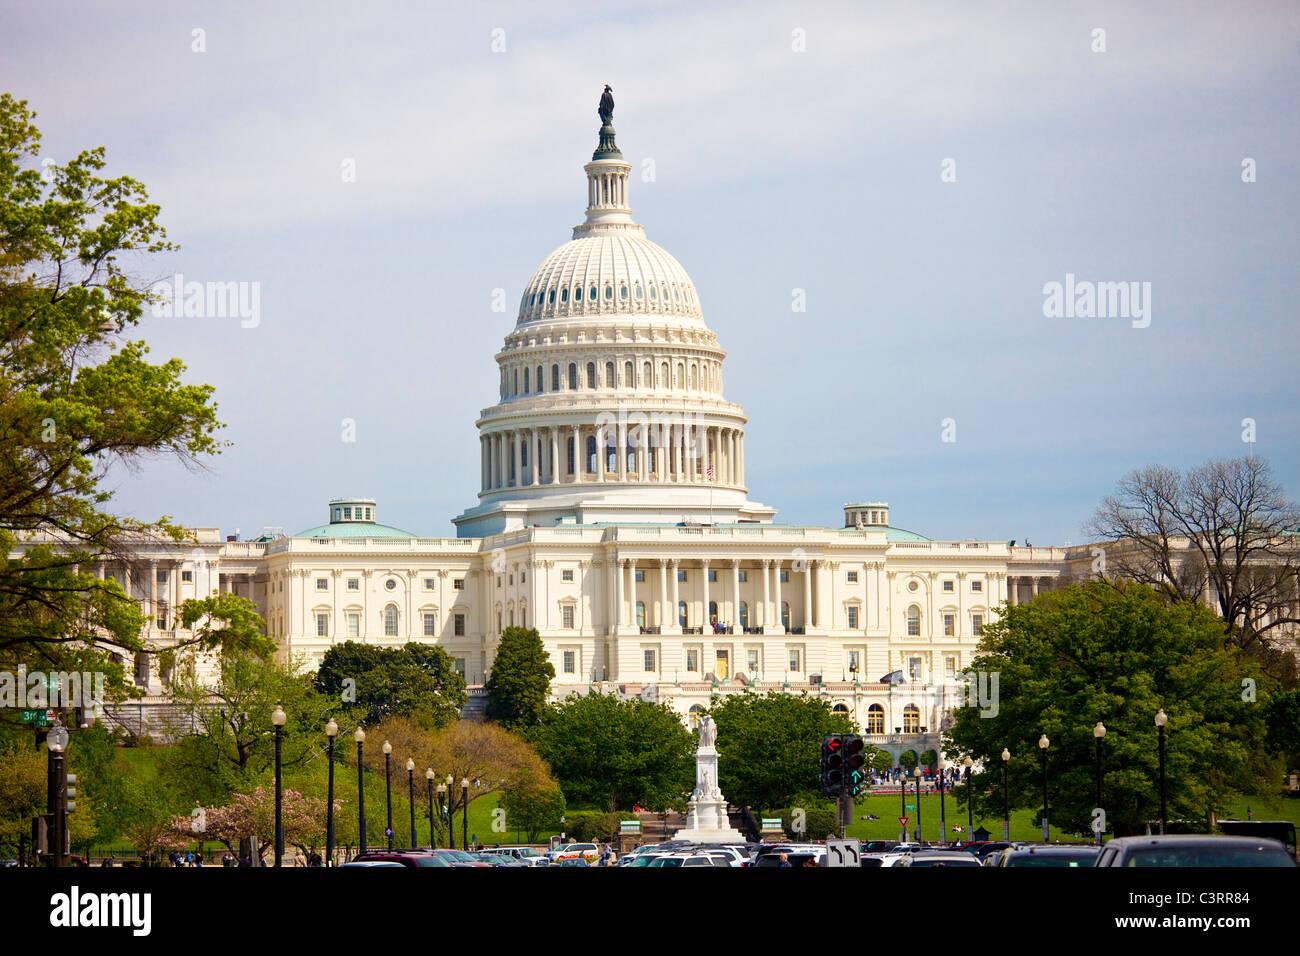 Capitol building, Washington DC - Stock Image